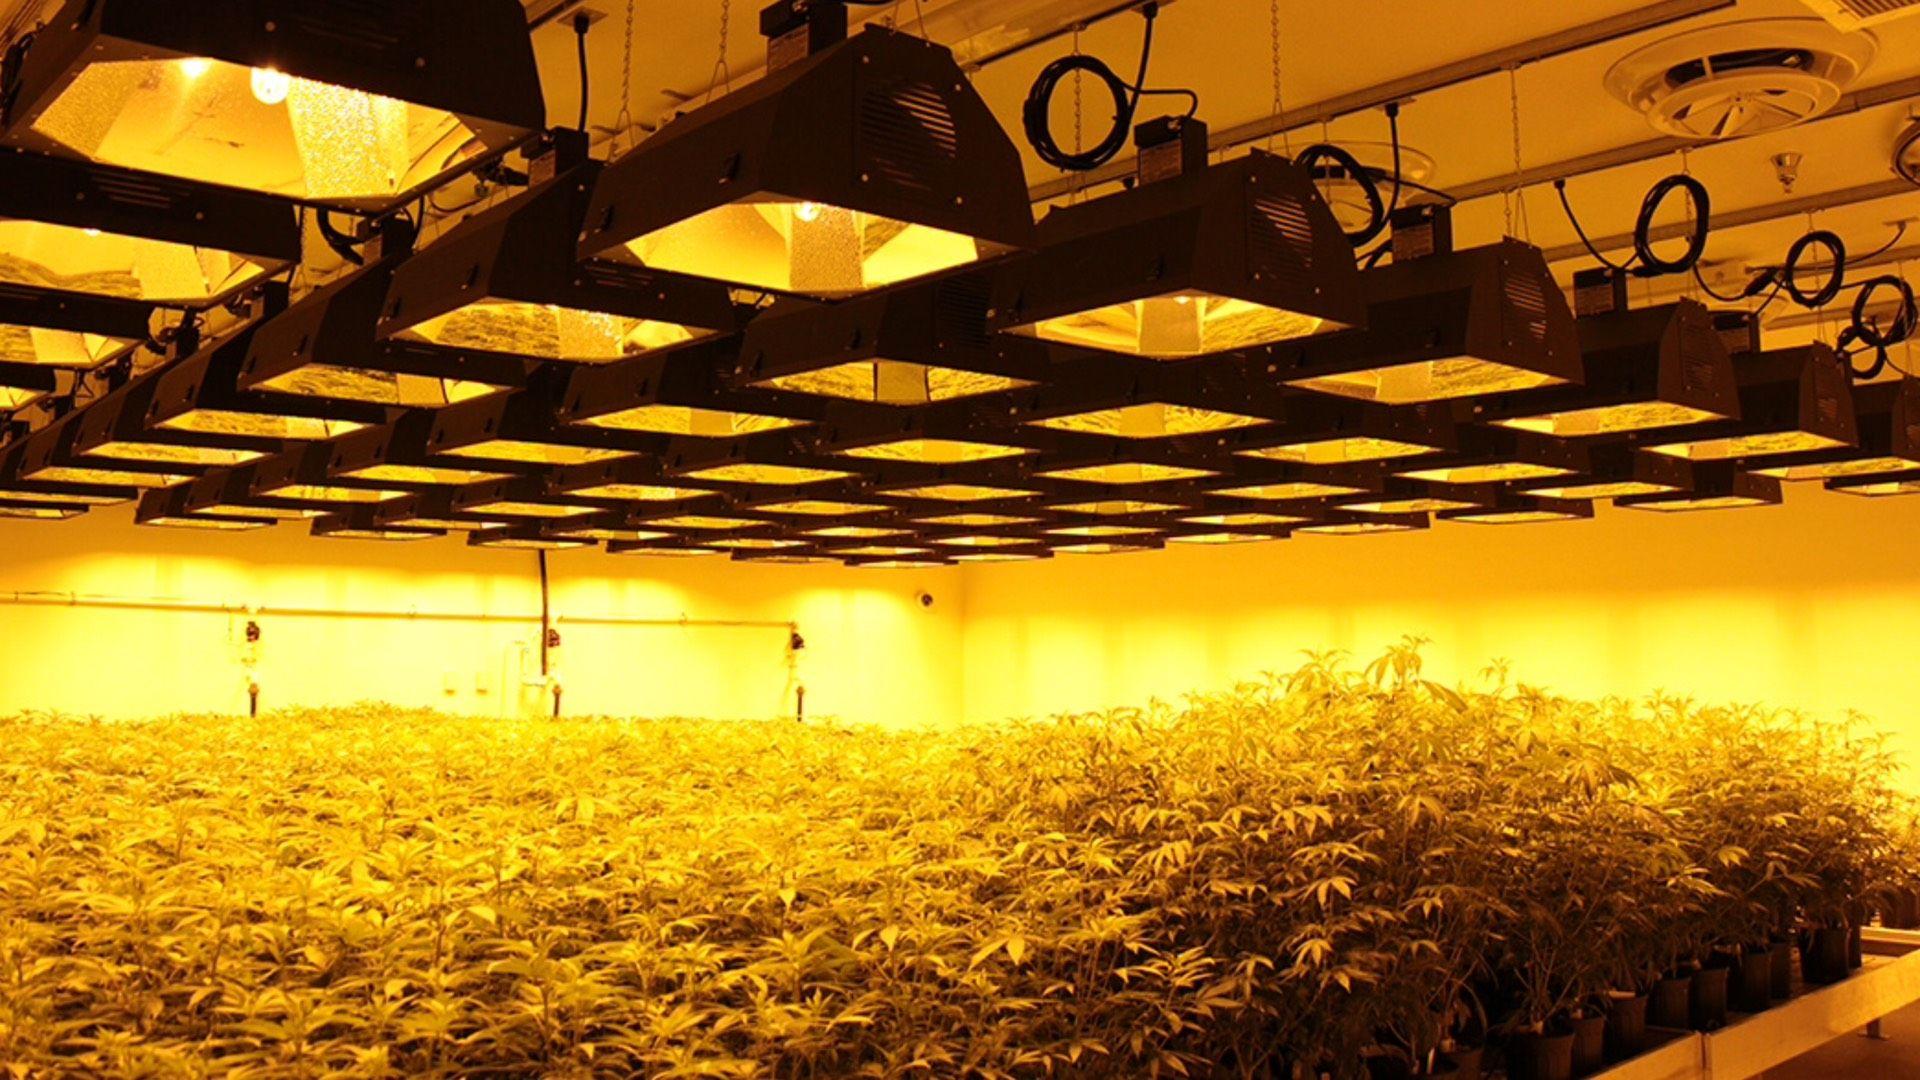 Growlite fixtures from Barrron Lighting.   #growlite #barronlighting #growlight #horticulture #hydroponics #oghood #growpatrol #growfacilities #oghood #sparky #electrician #lighting #themachine #extreme #willowelectric #karma #willowelectrical #growlitebybarron #hydrolife #cleanmeds #growops #growshop #hydrostore #grow #horticulture #garden #urbanfarmer